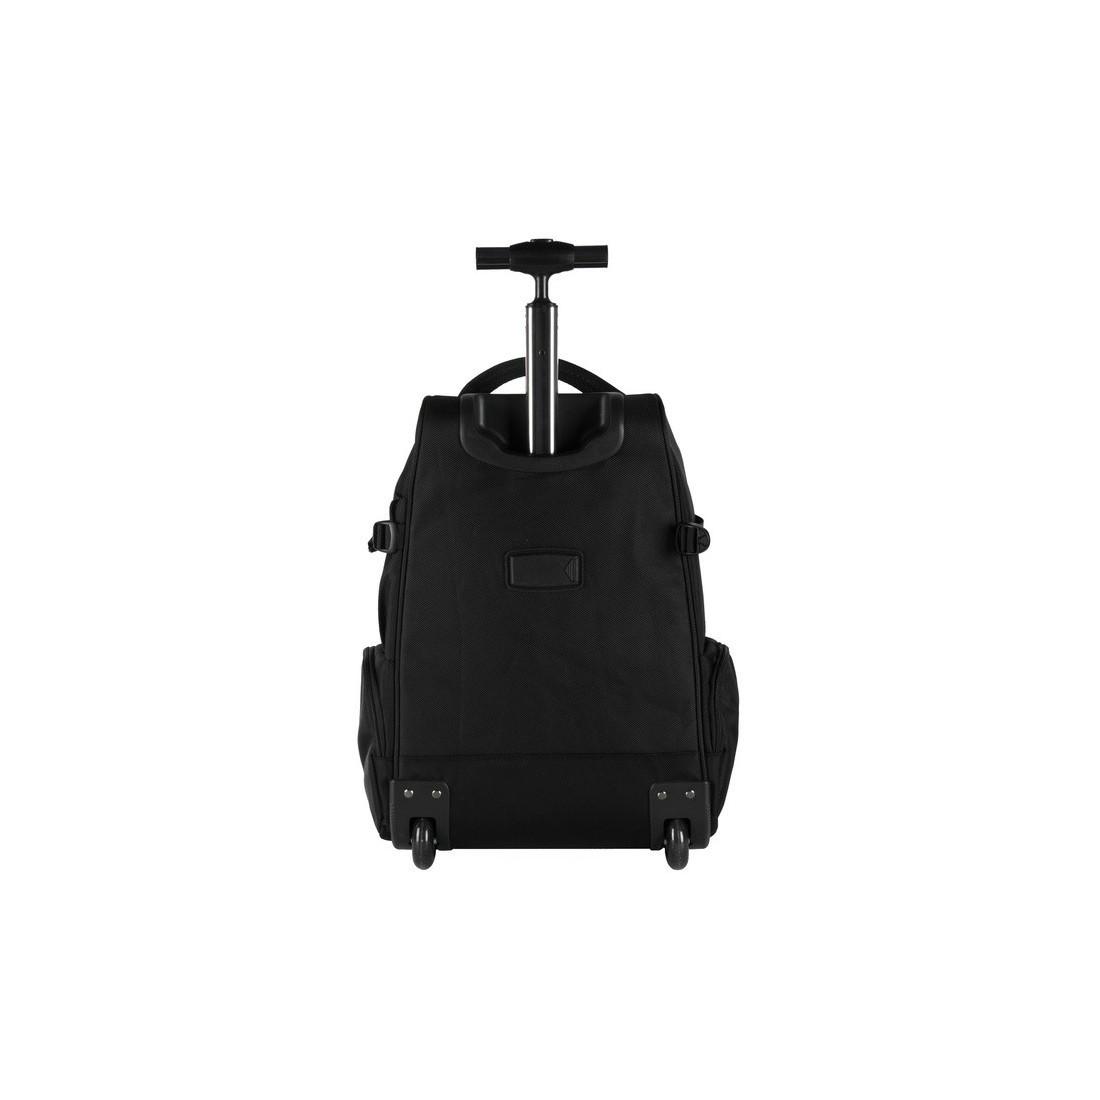 Plecak na kółkach biznesowy czarny z komorą na laptop - plecak-tornister.pl